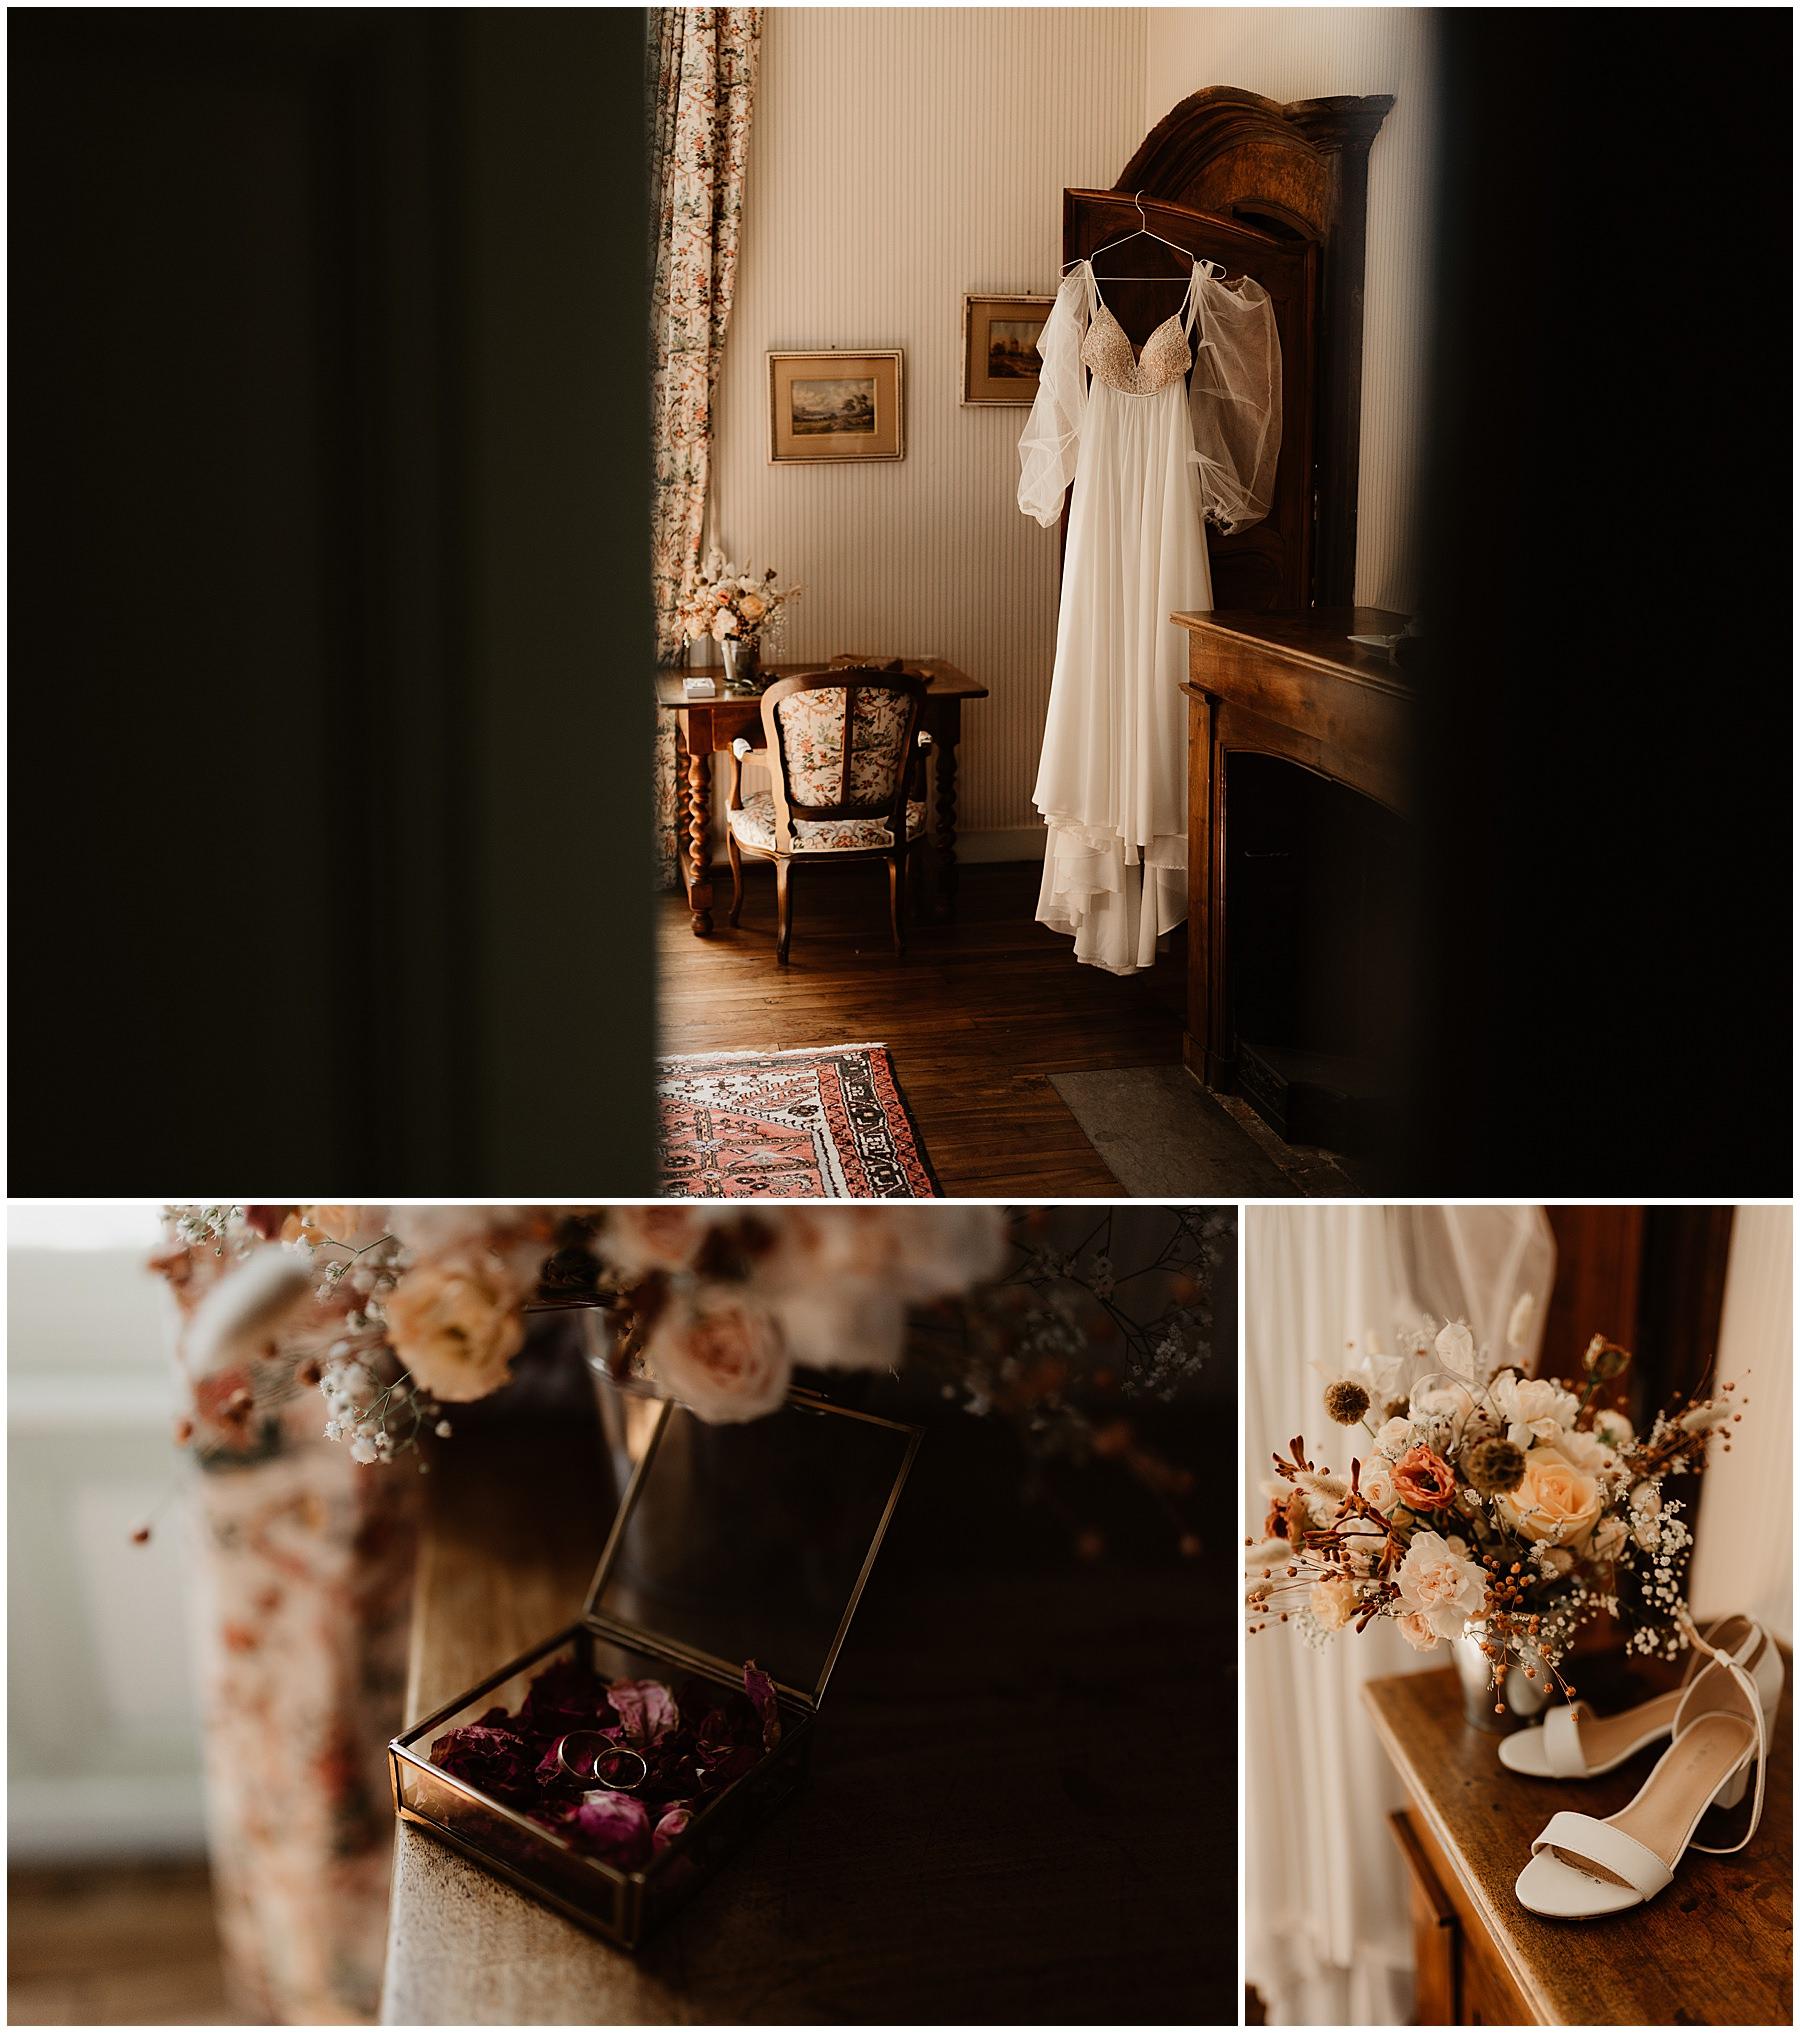 Château des Gaudras mariage photographe